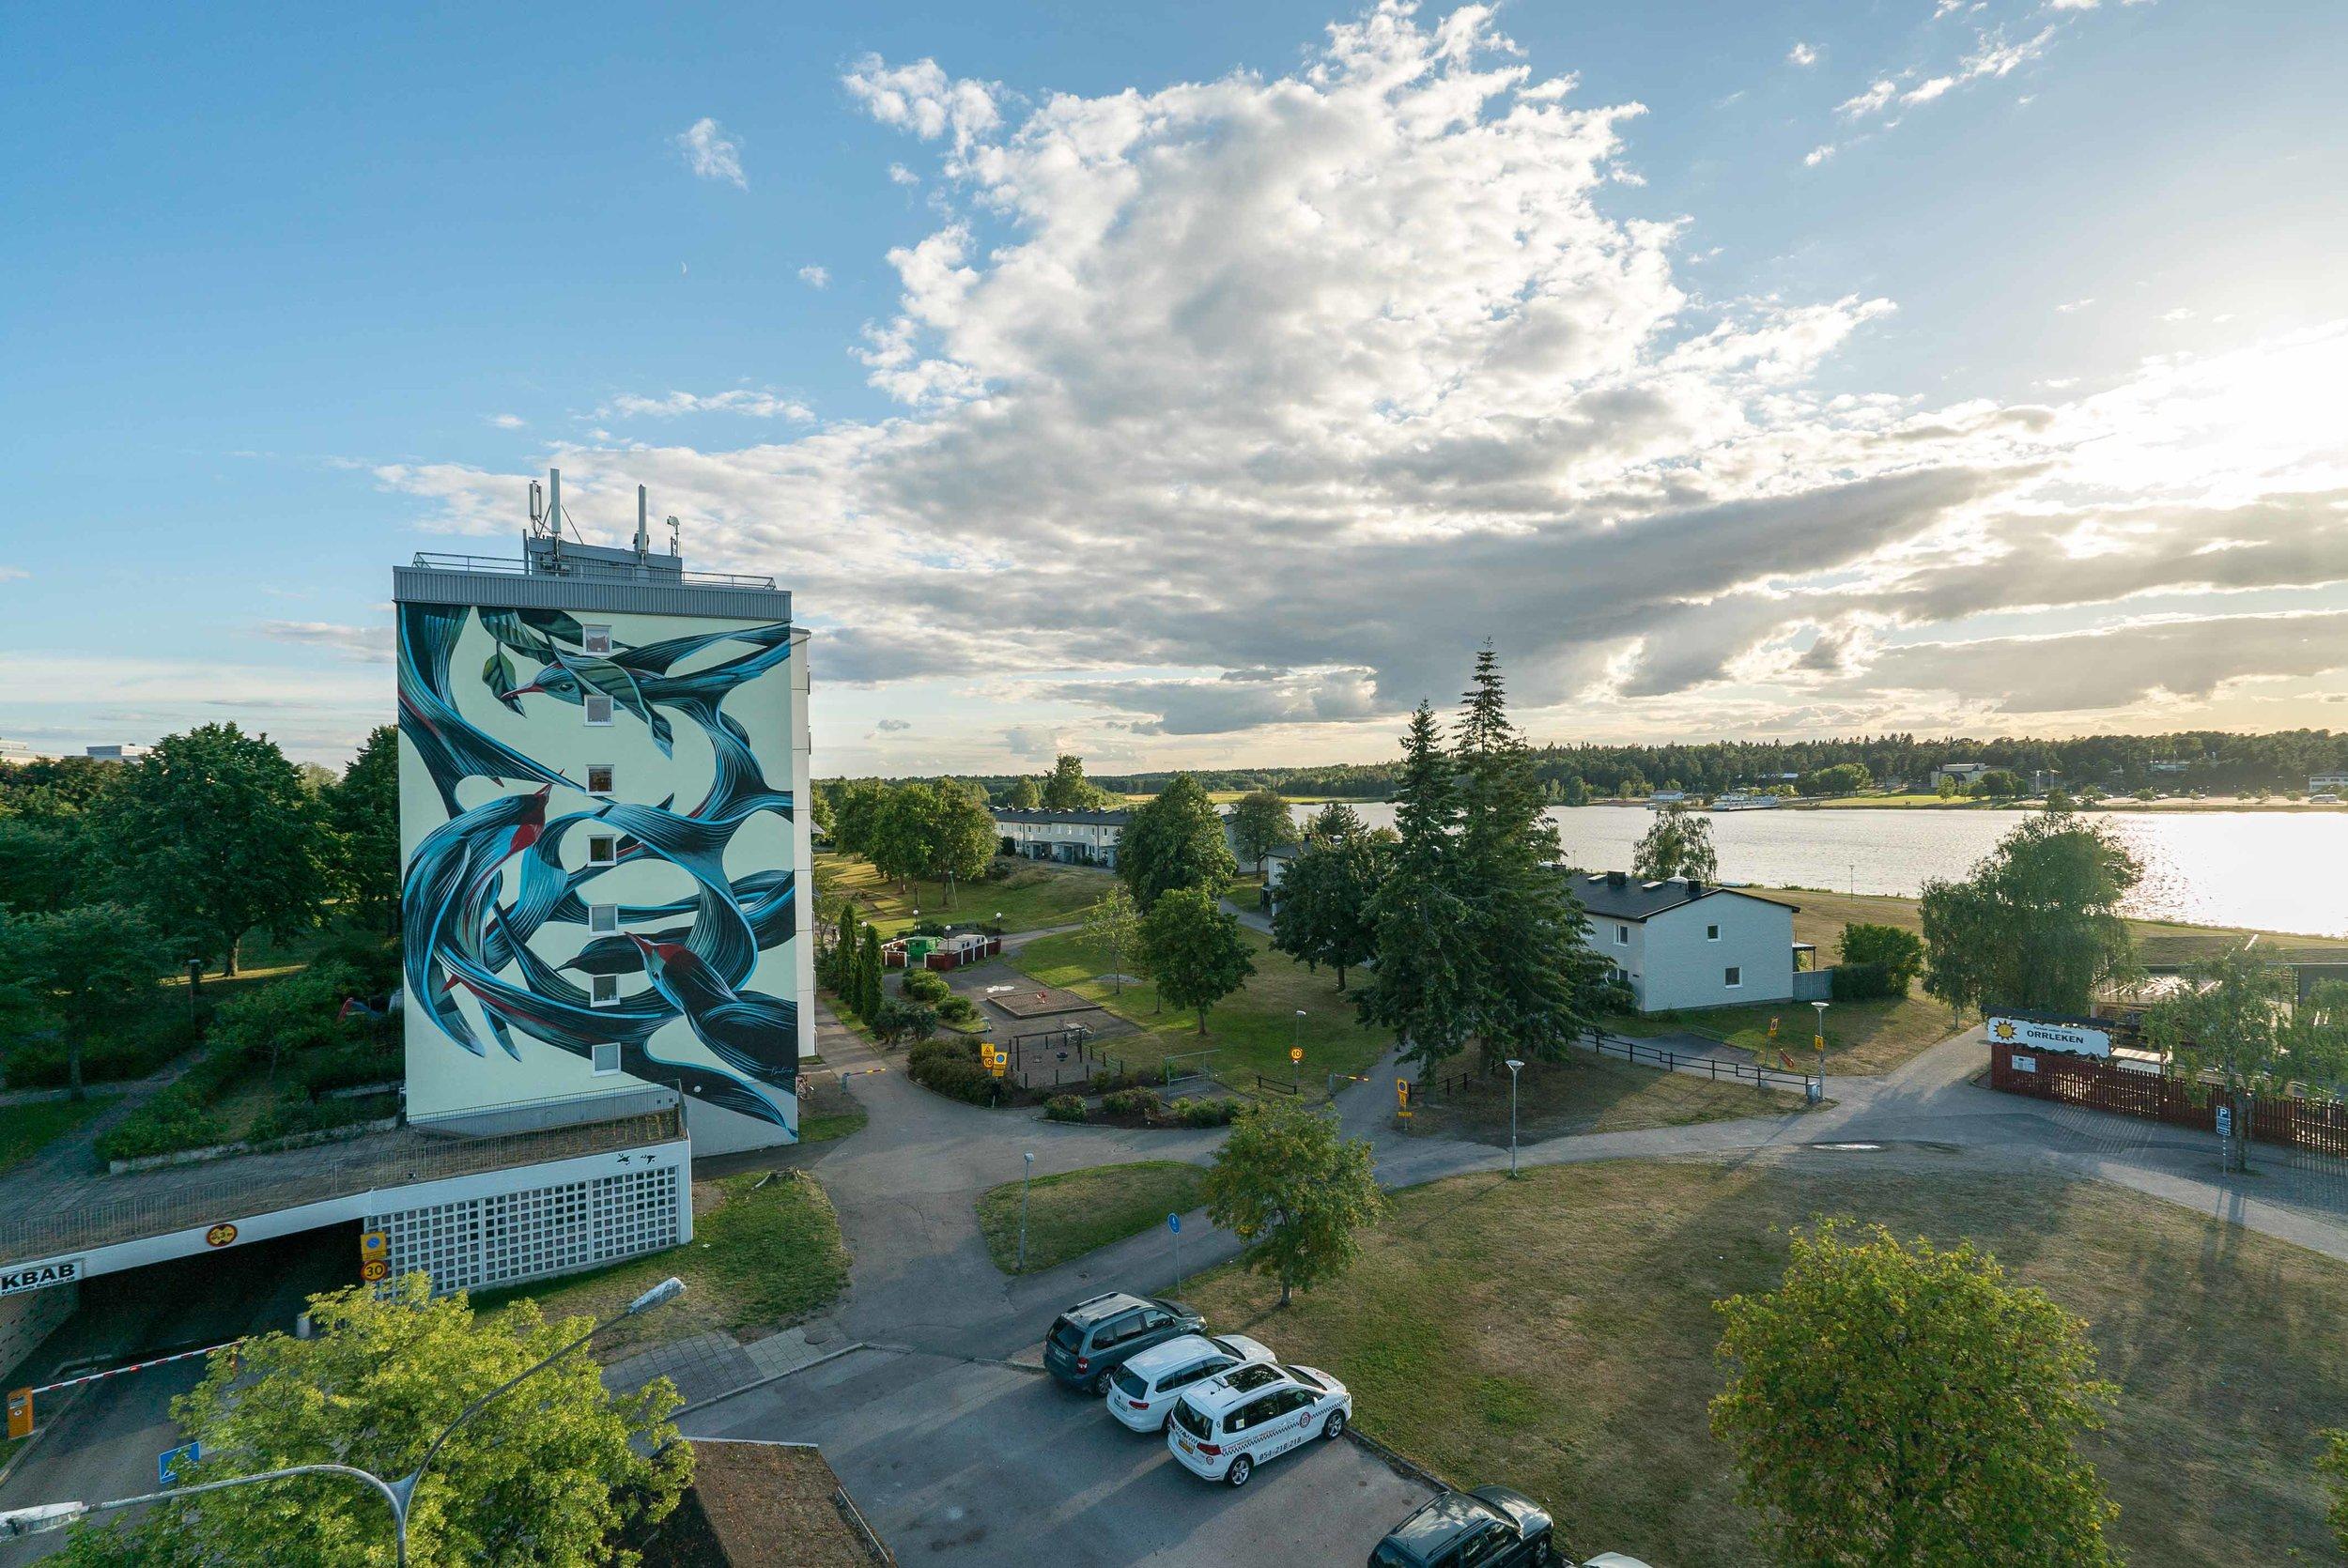 Pantonio_2_Artscape_2017-07-31_FredrikÅkerberg_4240×2832.16.jpg